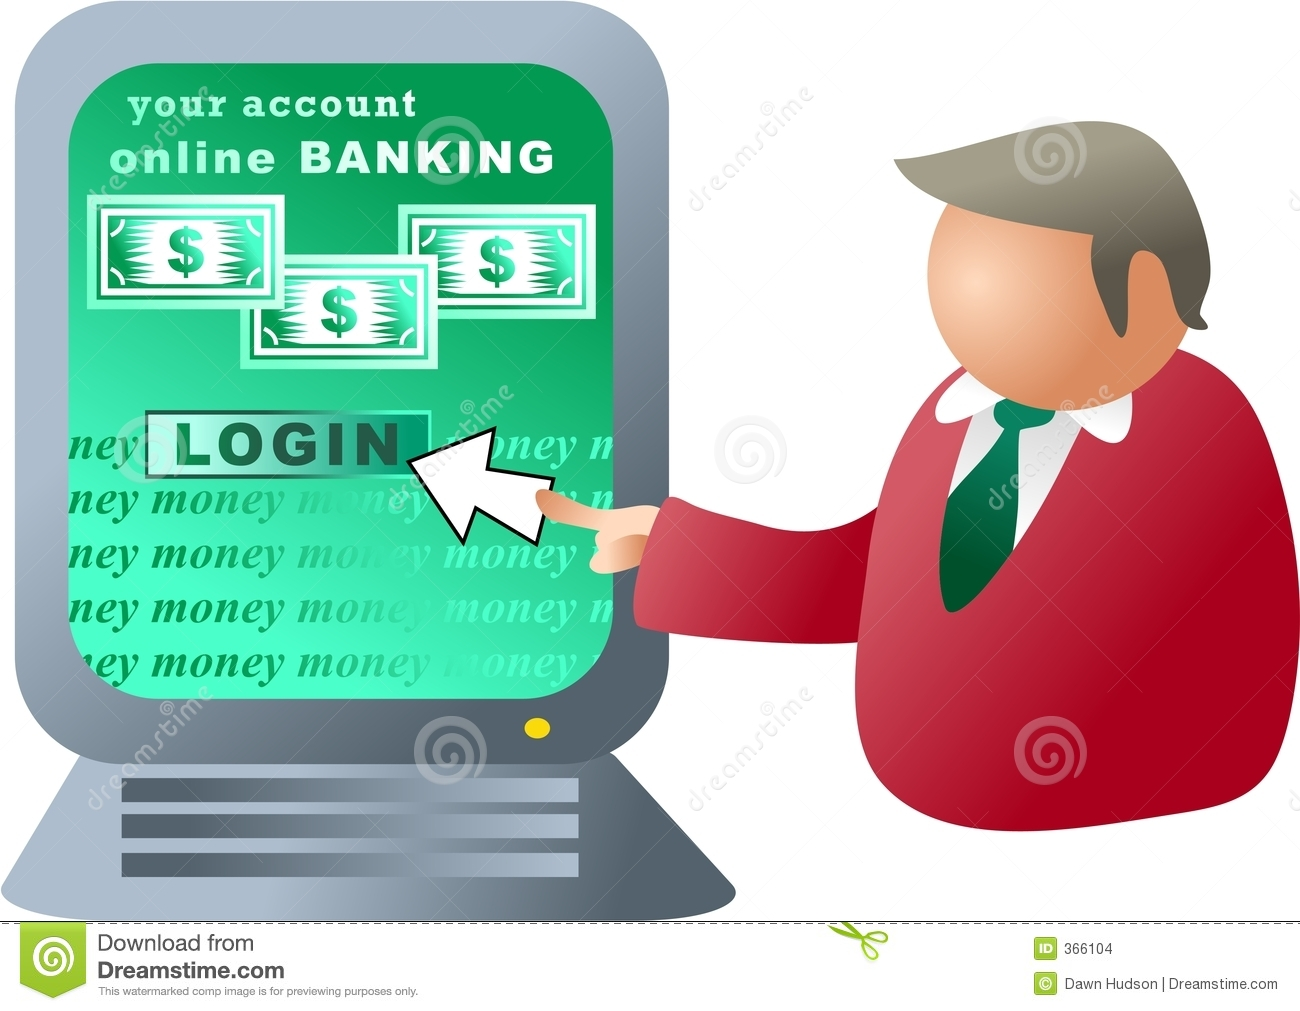 Computer Banking Stock Illustration. Ill-Computer banking stock illustration. Illustration of executives - 366104-4